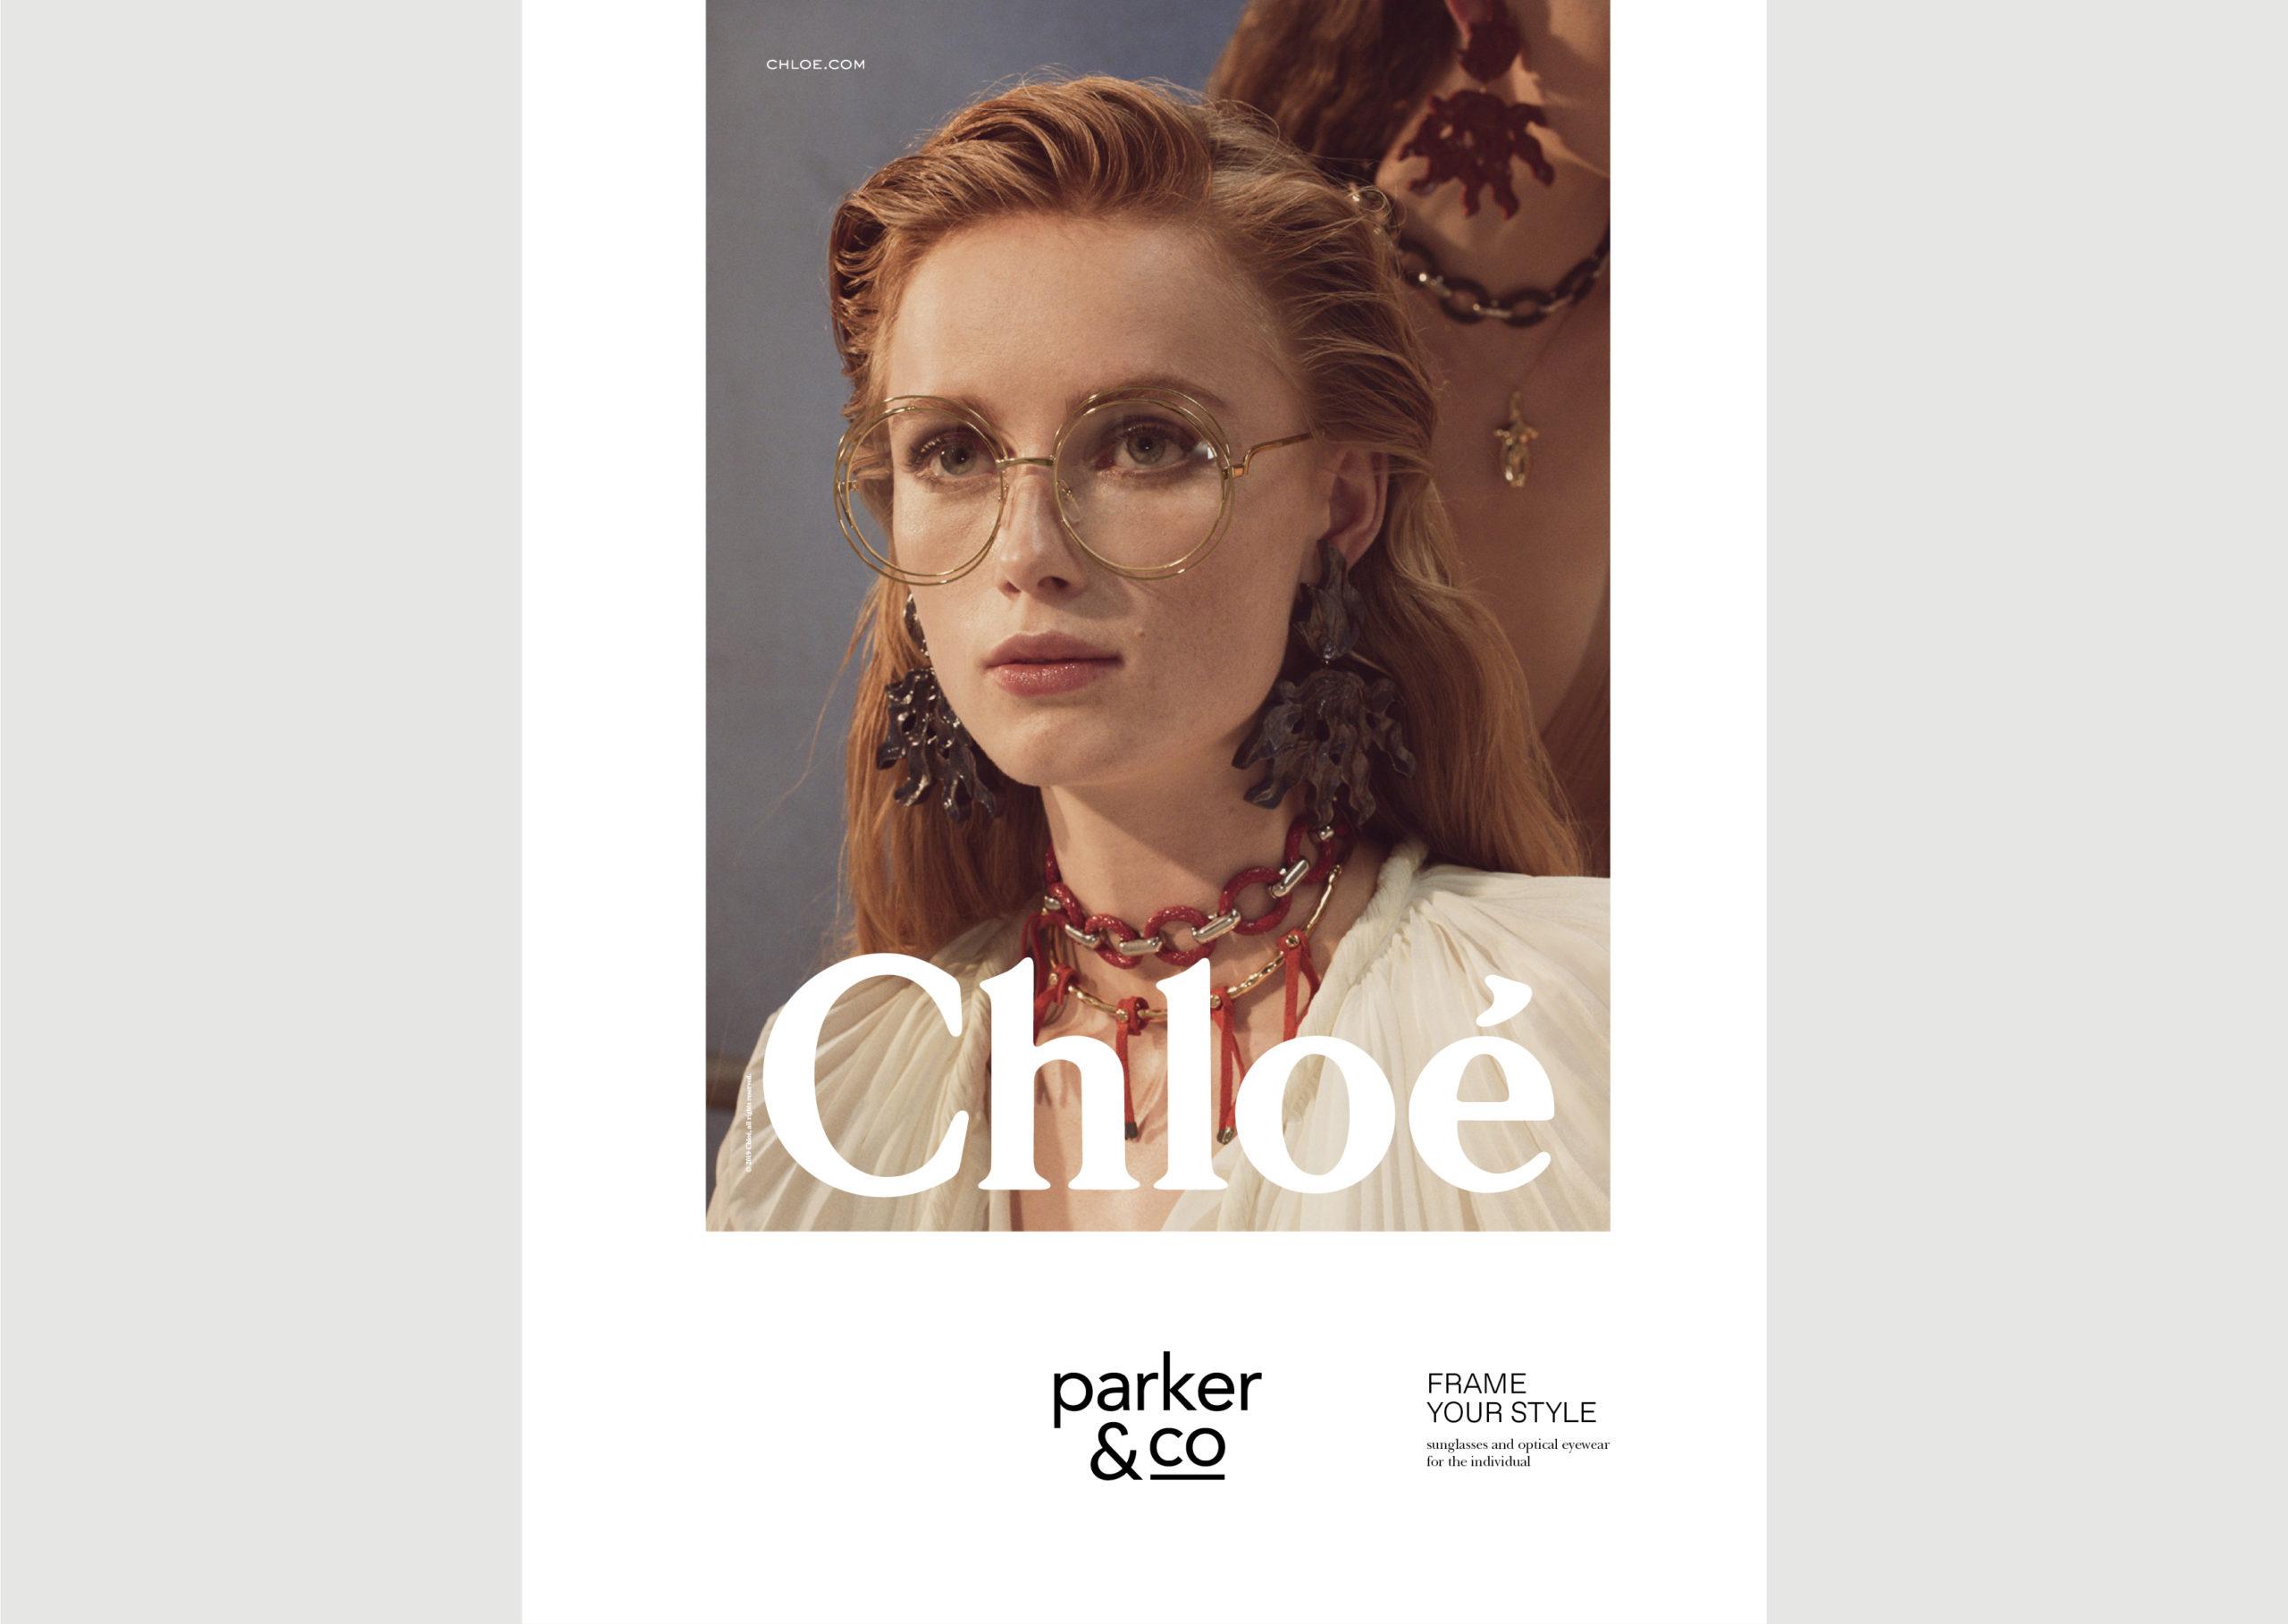 Parker and Co Eyewear – Denizen Ad – featuring Chloe 2019